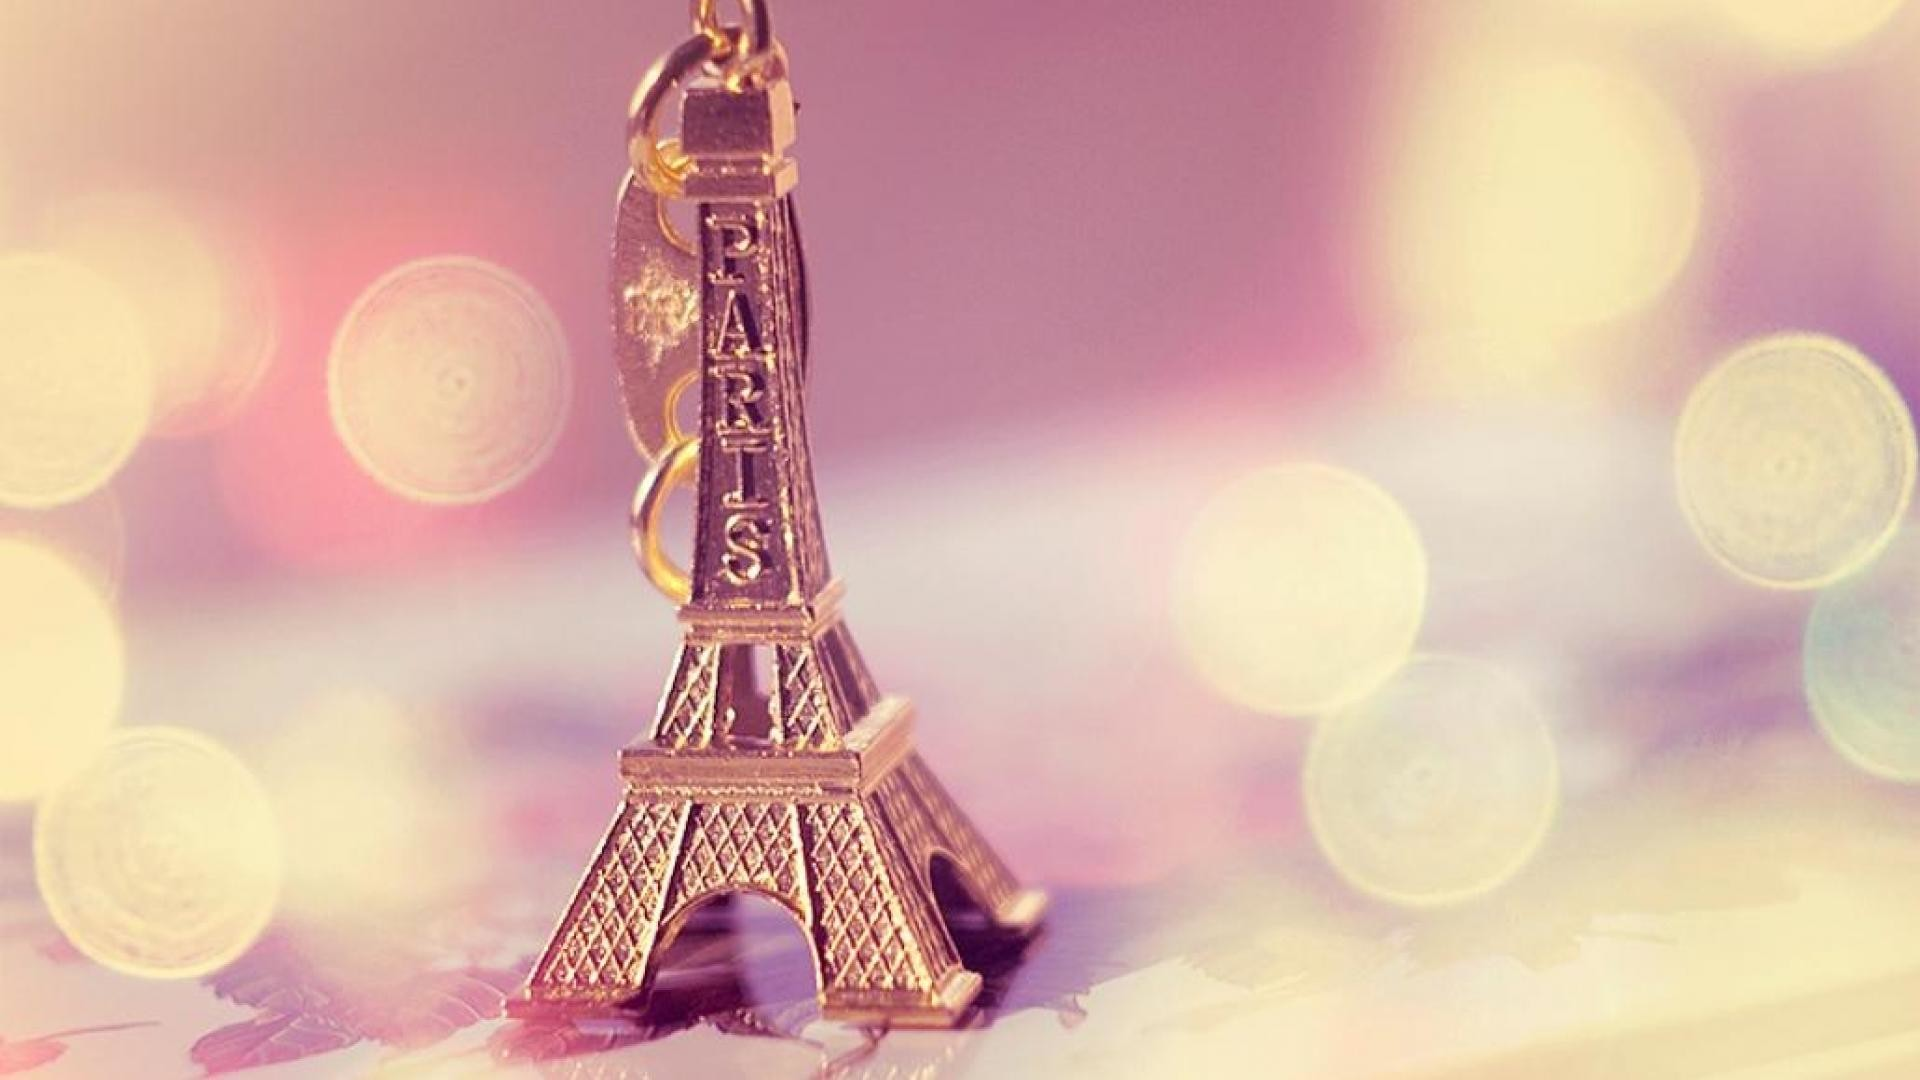 Cute Paris Wallpaper 72 Images